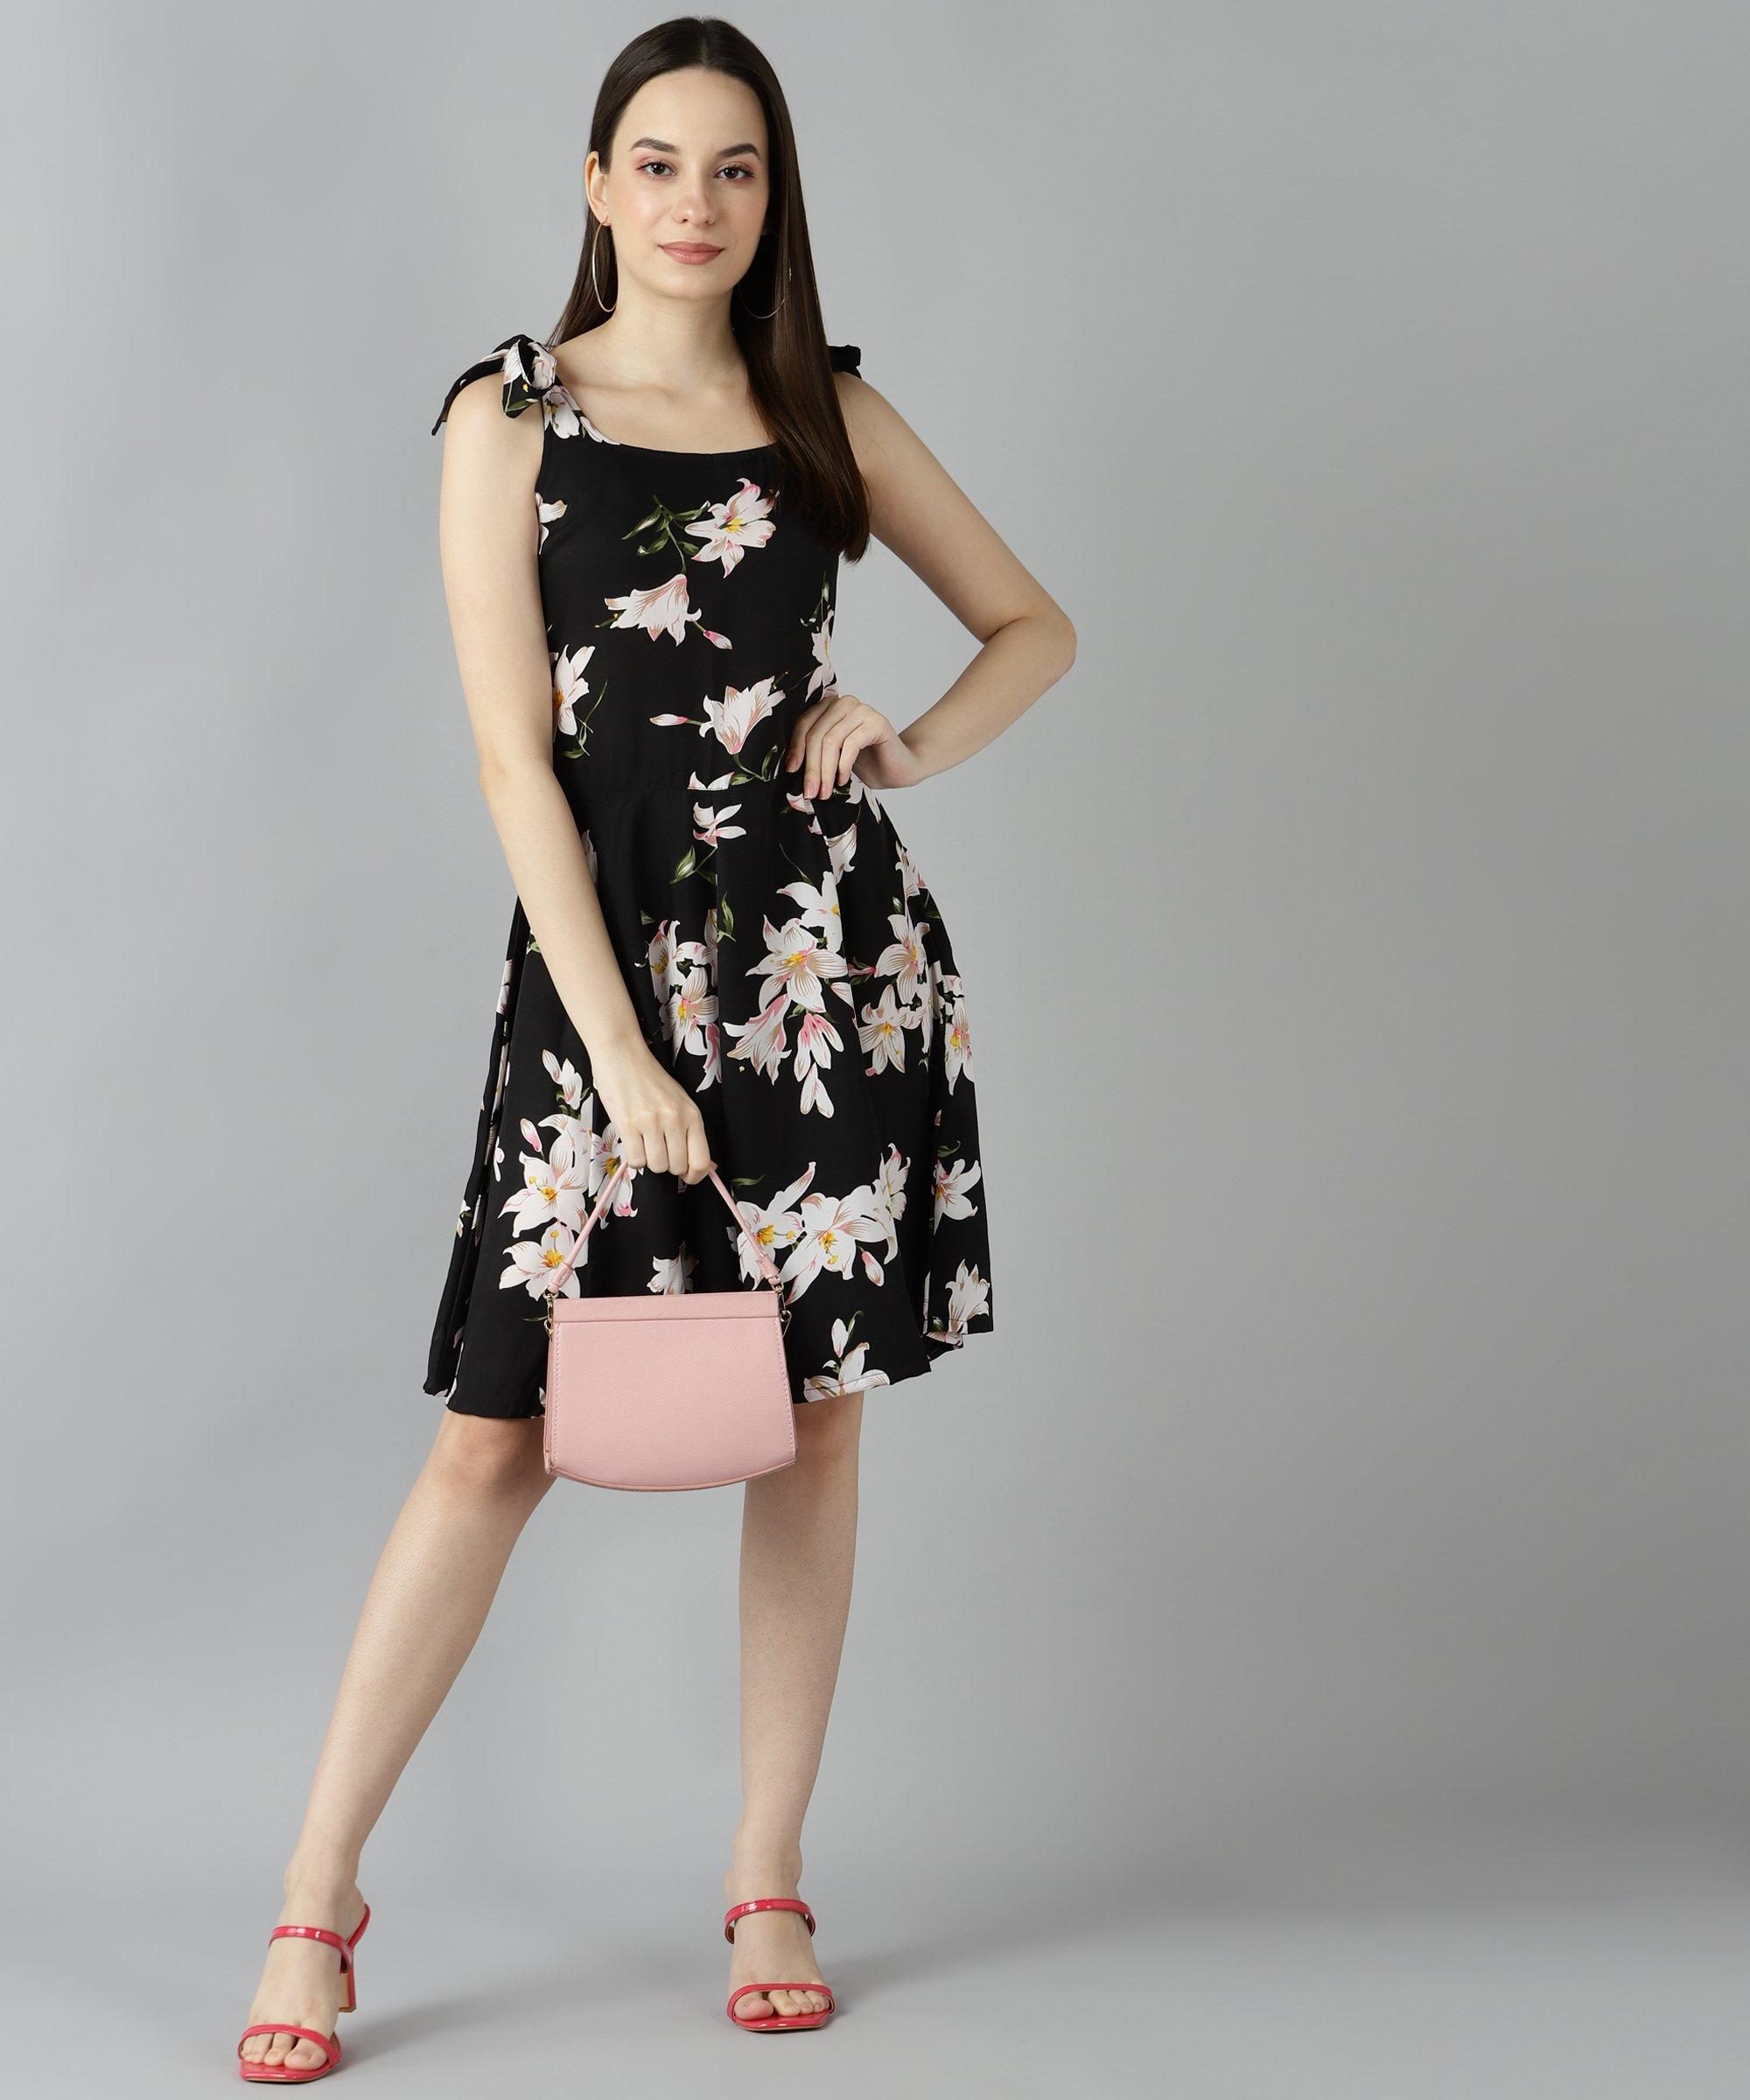 ZNX CLOTHING |  Women Floral Printed Black Tie Dress